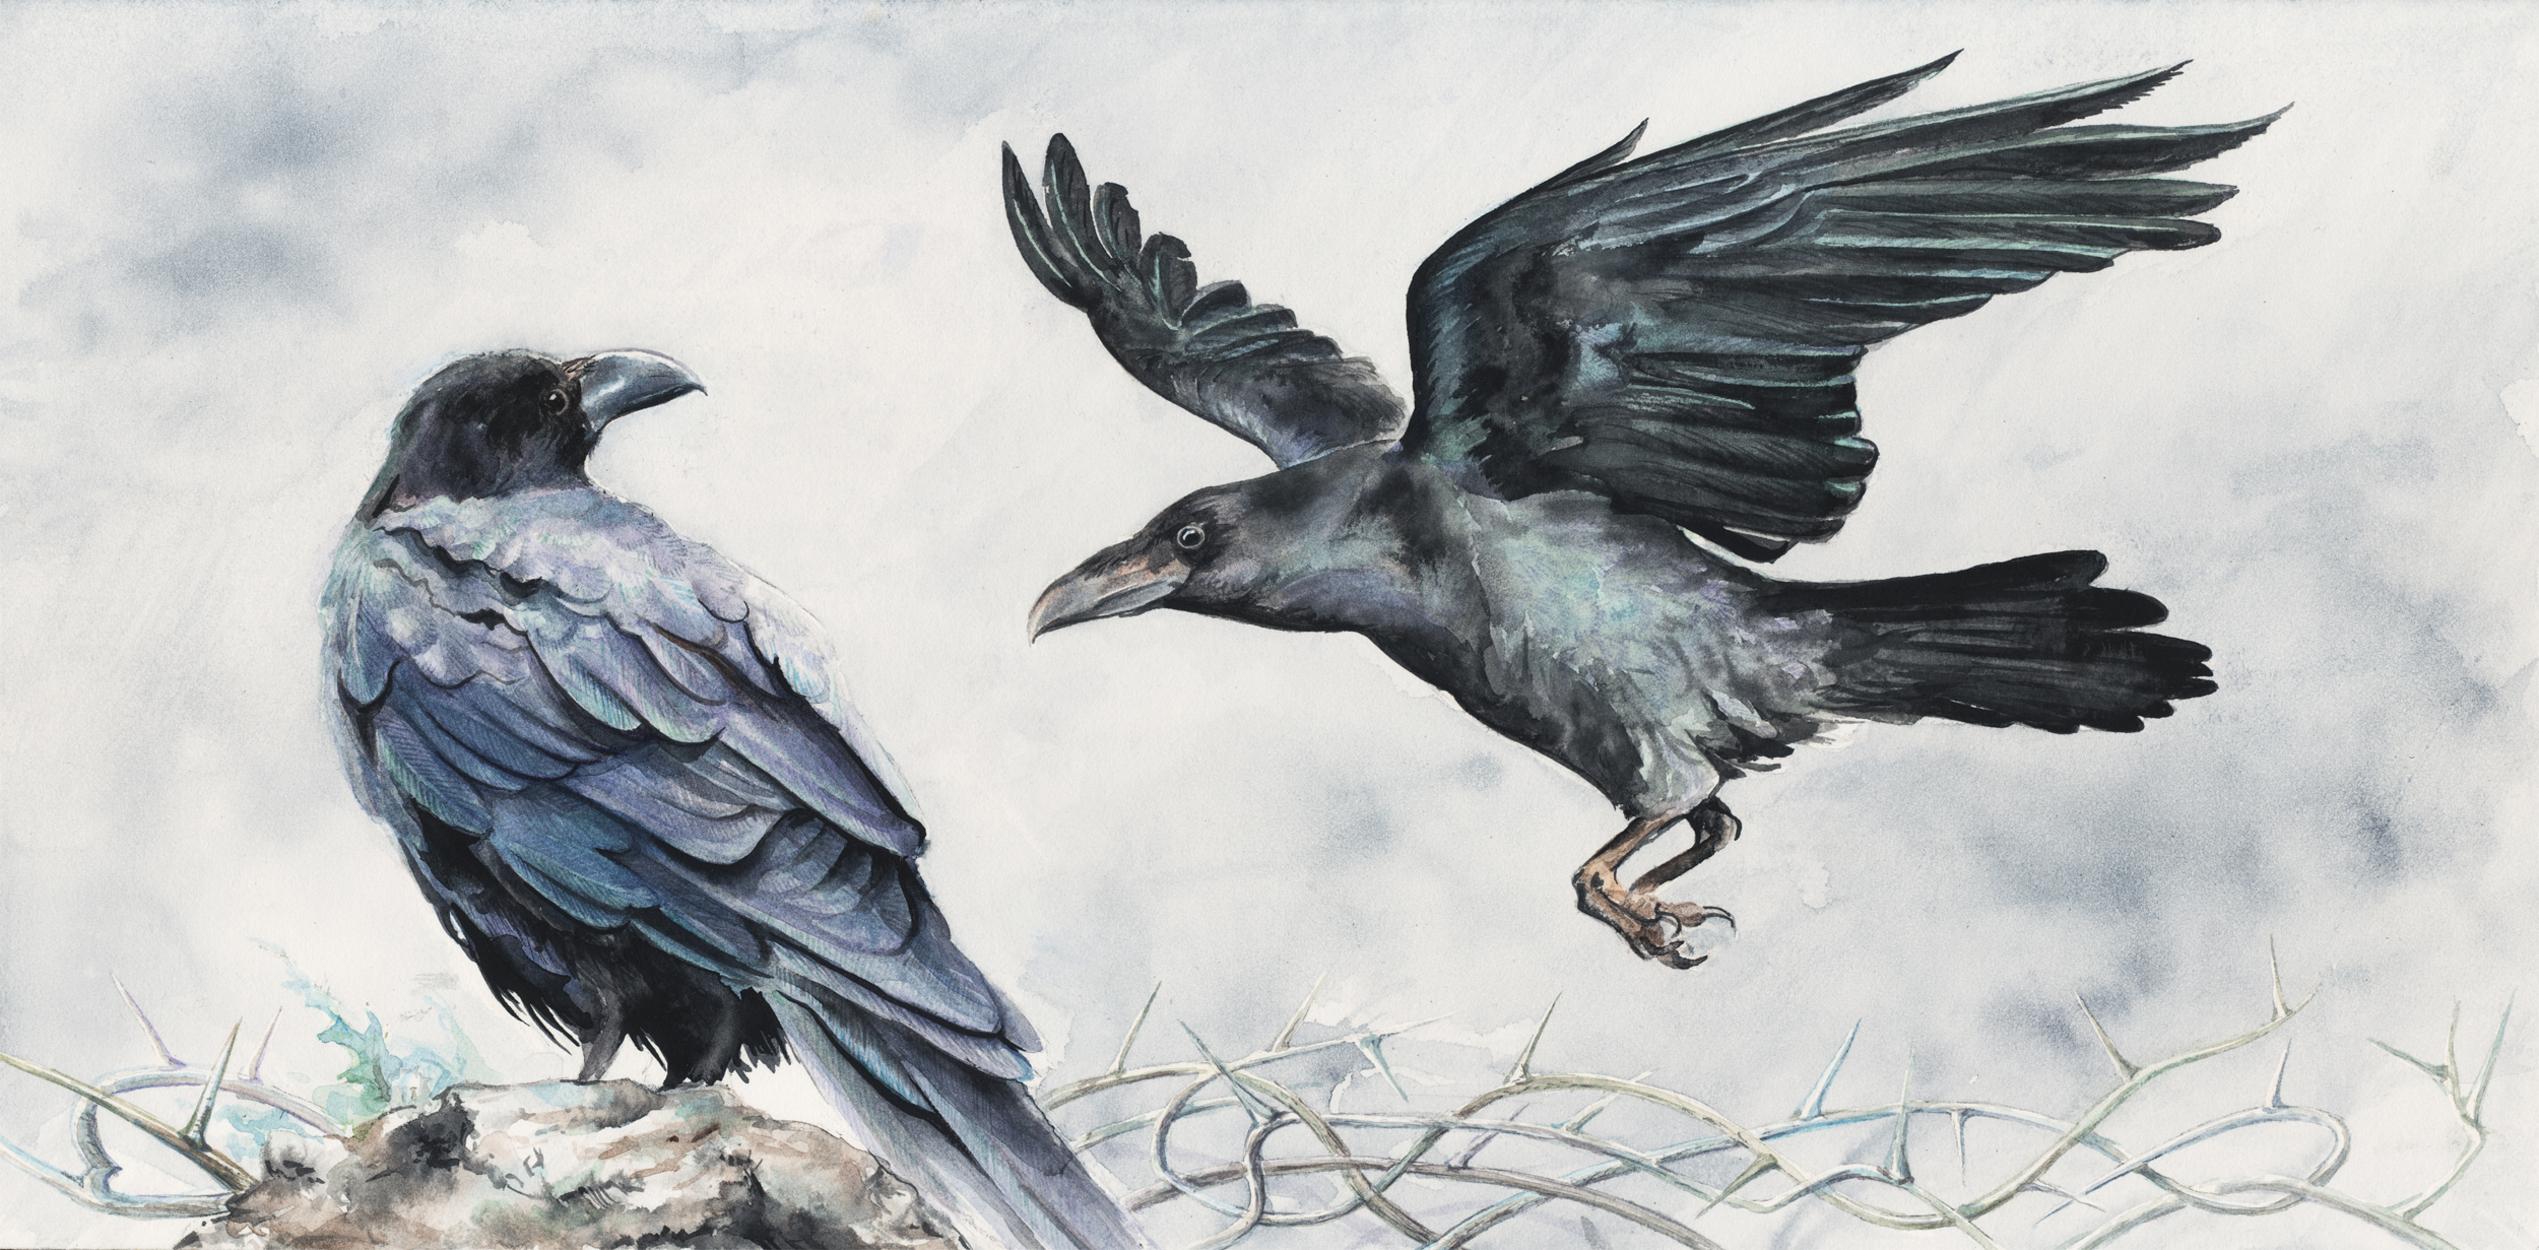 Huginn and Muninn Artwork by Mariya Prytula